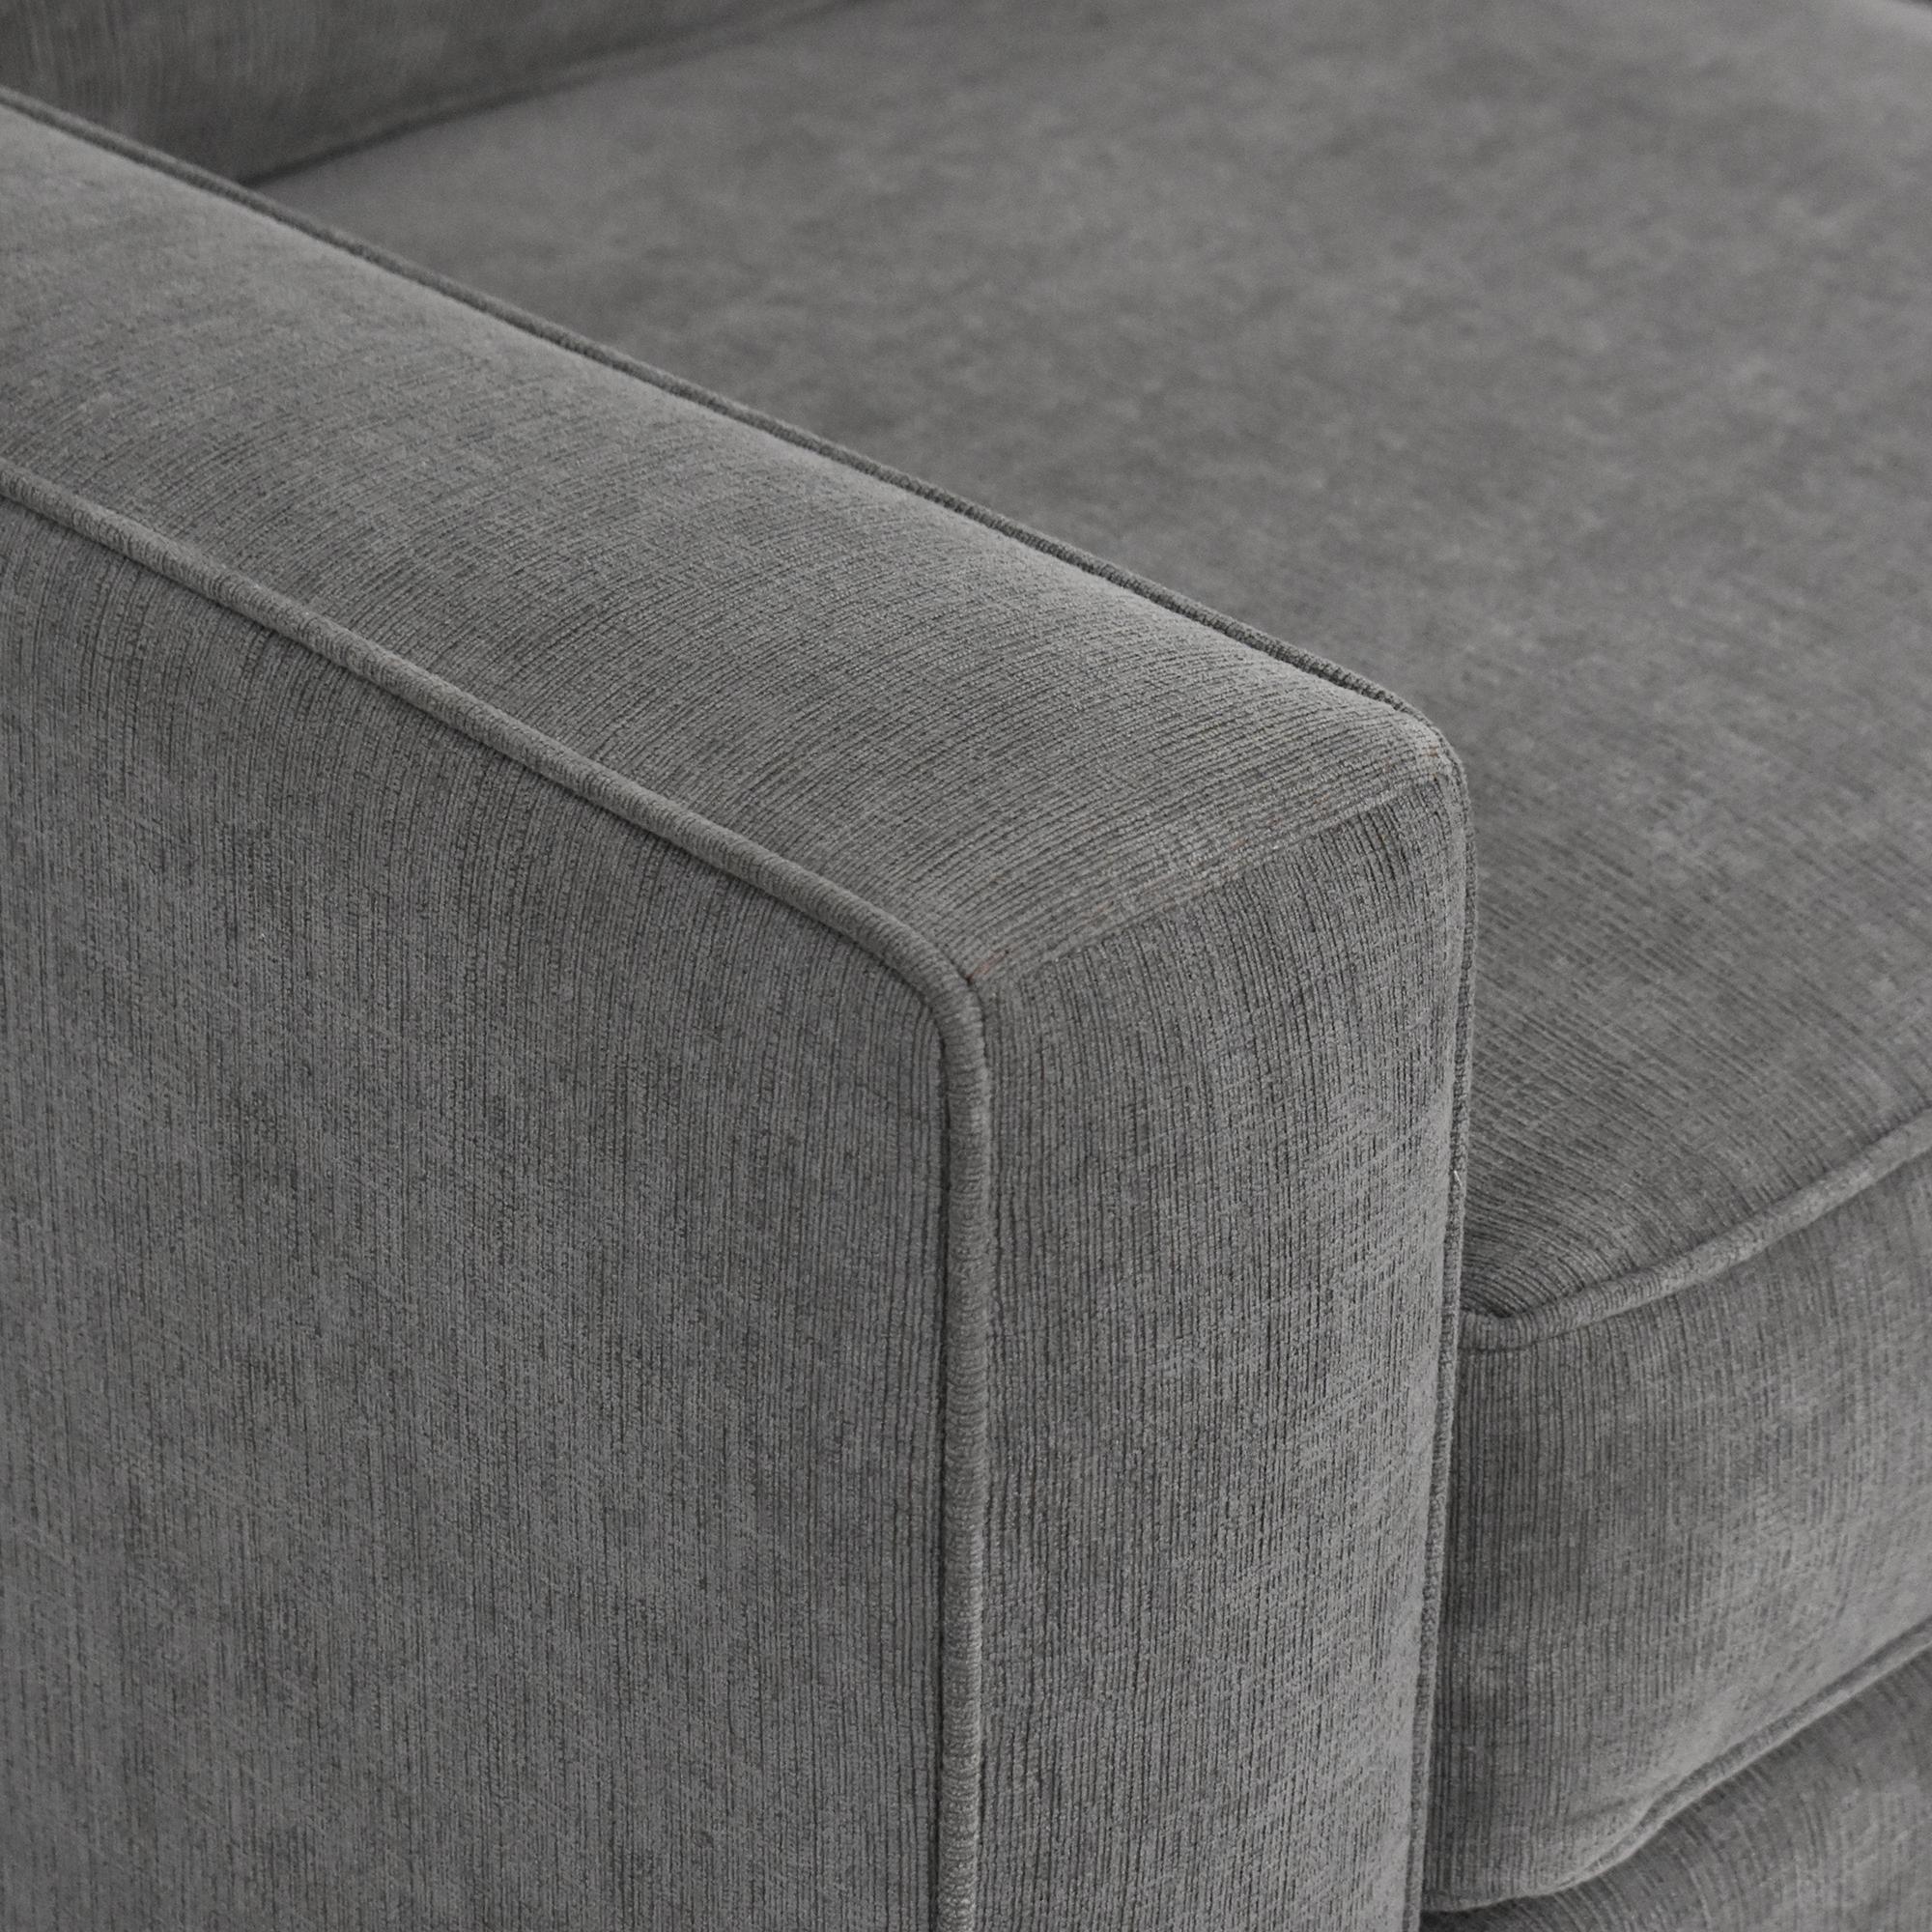 Macy's Macy's Radley Three Piece Chaise Sectional Sofa dimensions